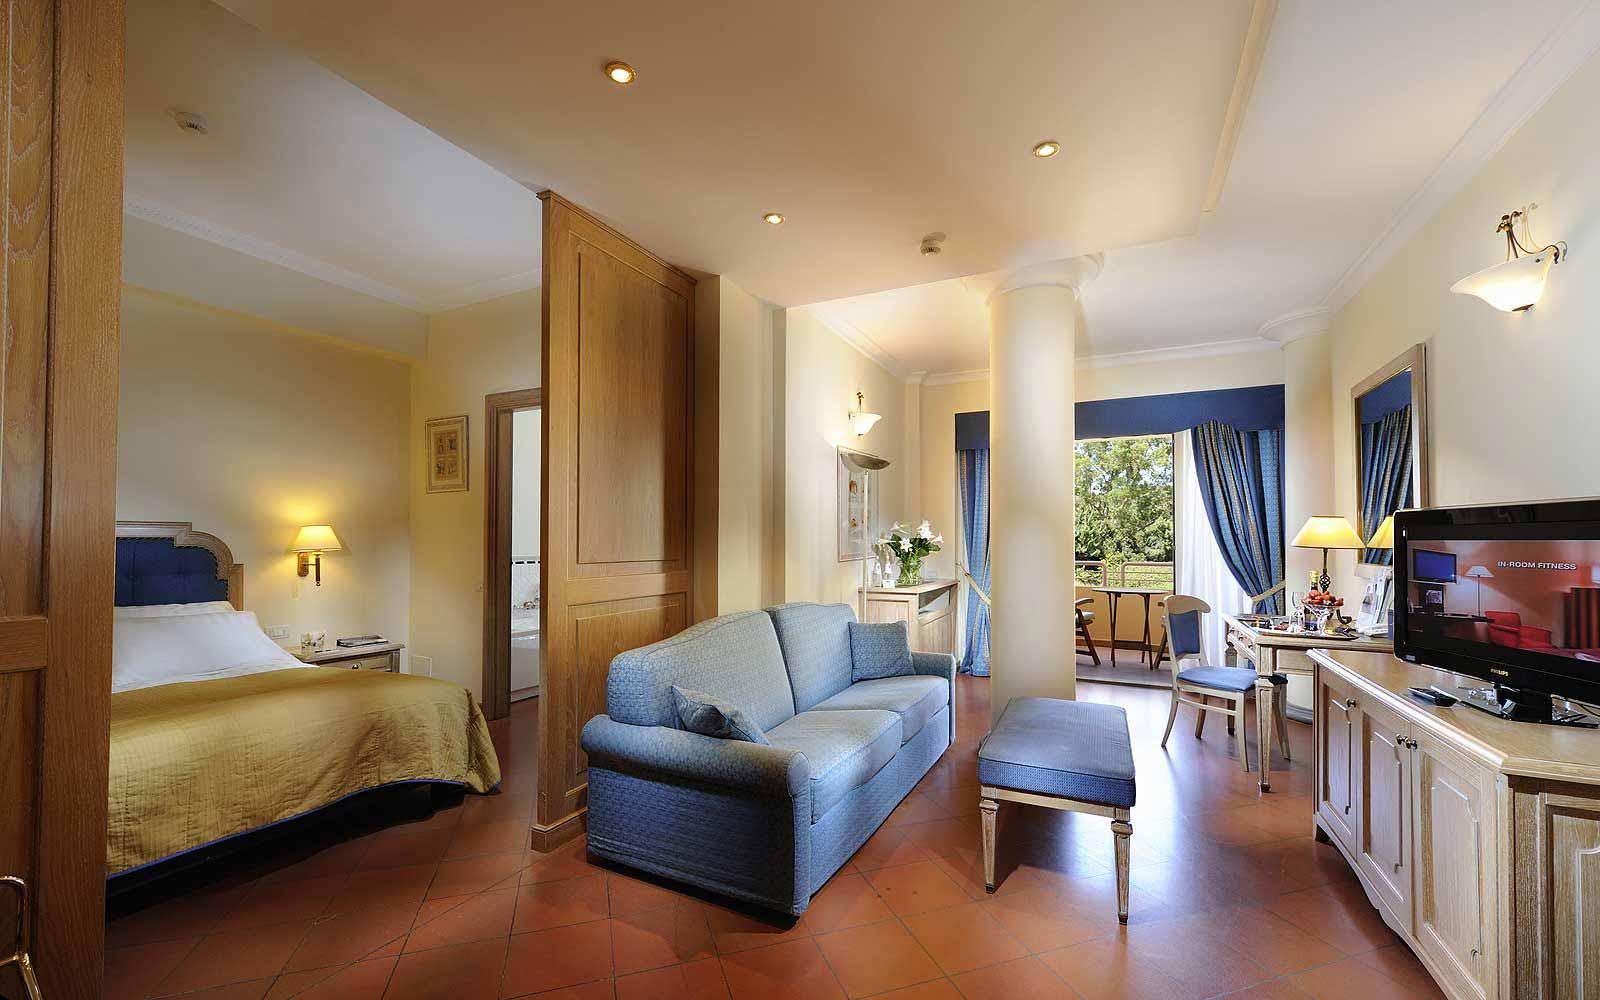 Marina 2 Suite at Pullman Timi Ama Sardegna